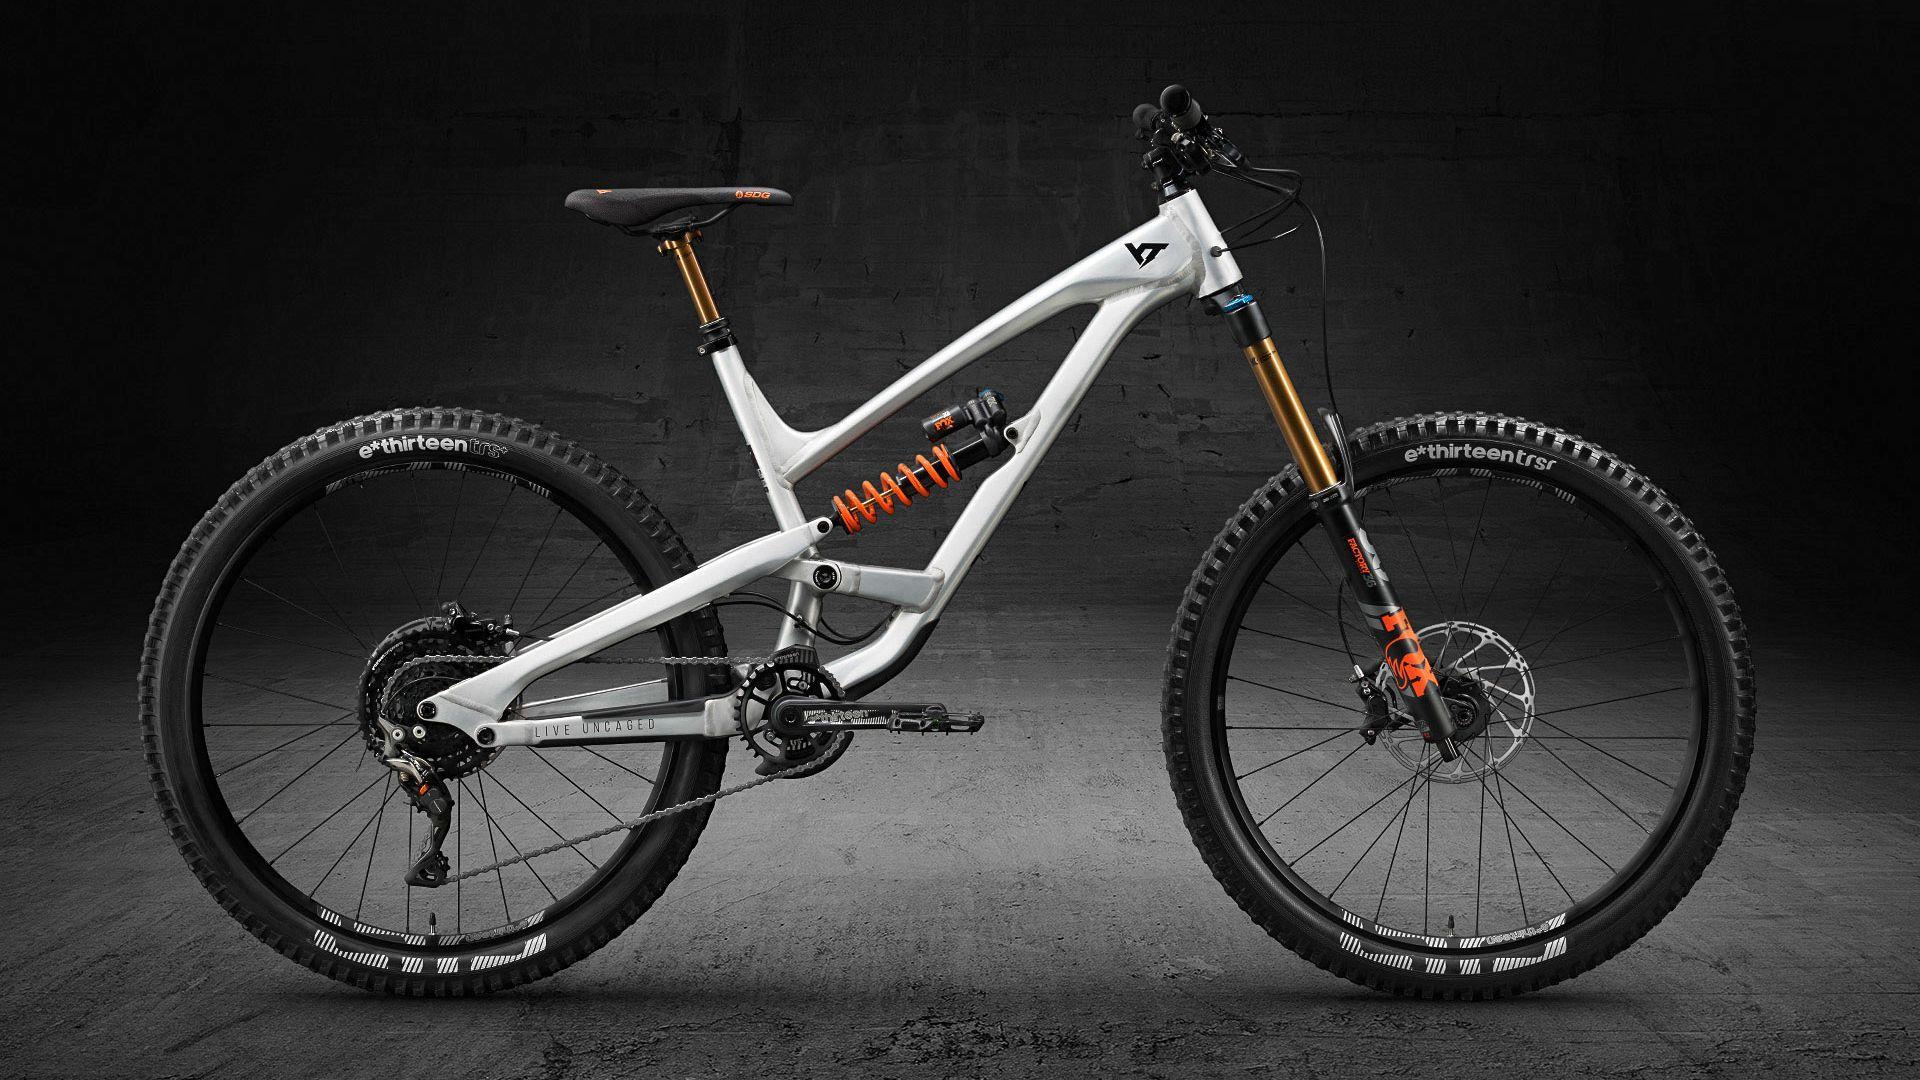 Yt Launches Limited Edition Capra Bike Bicycle Bike Bike Magazine